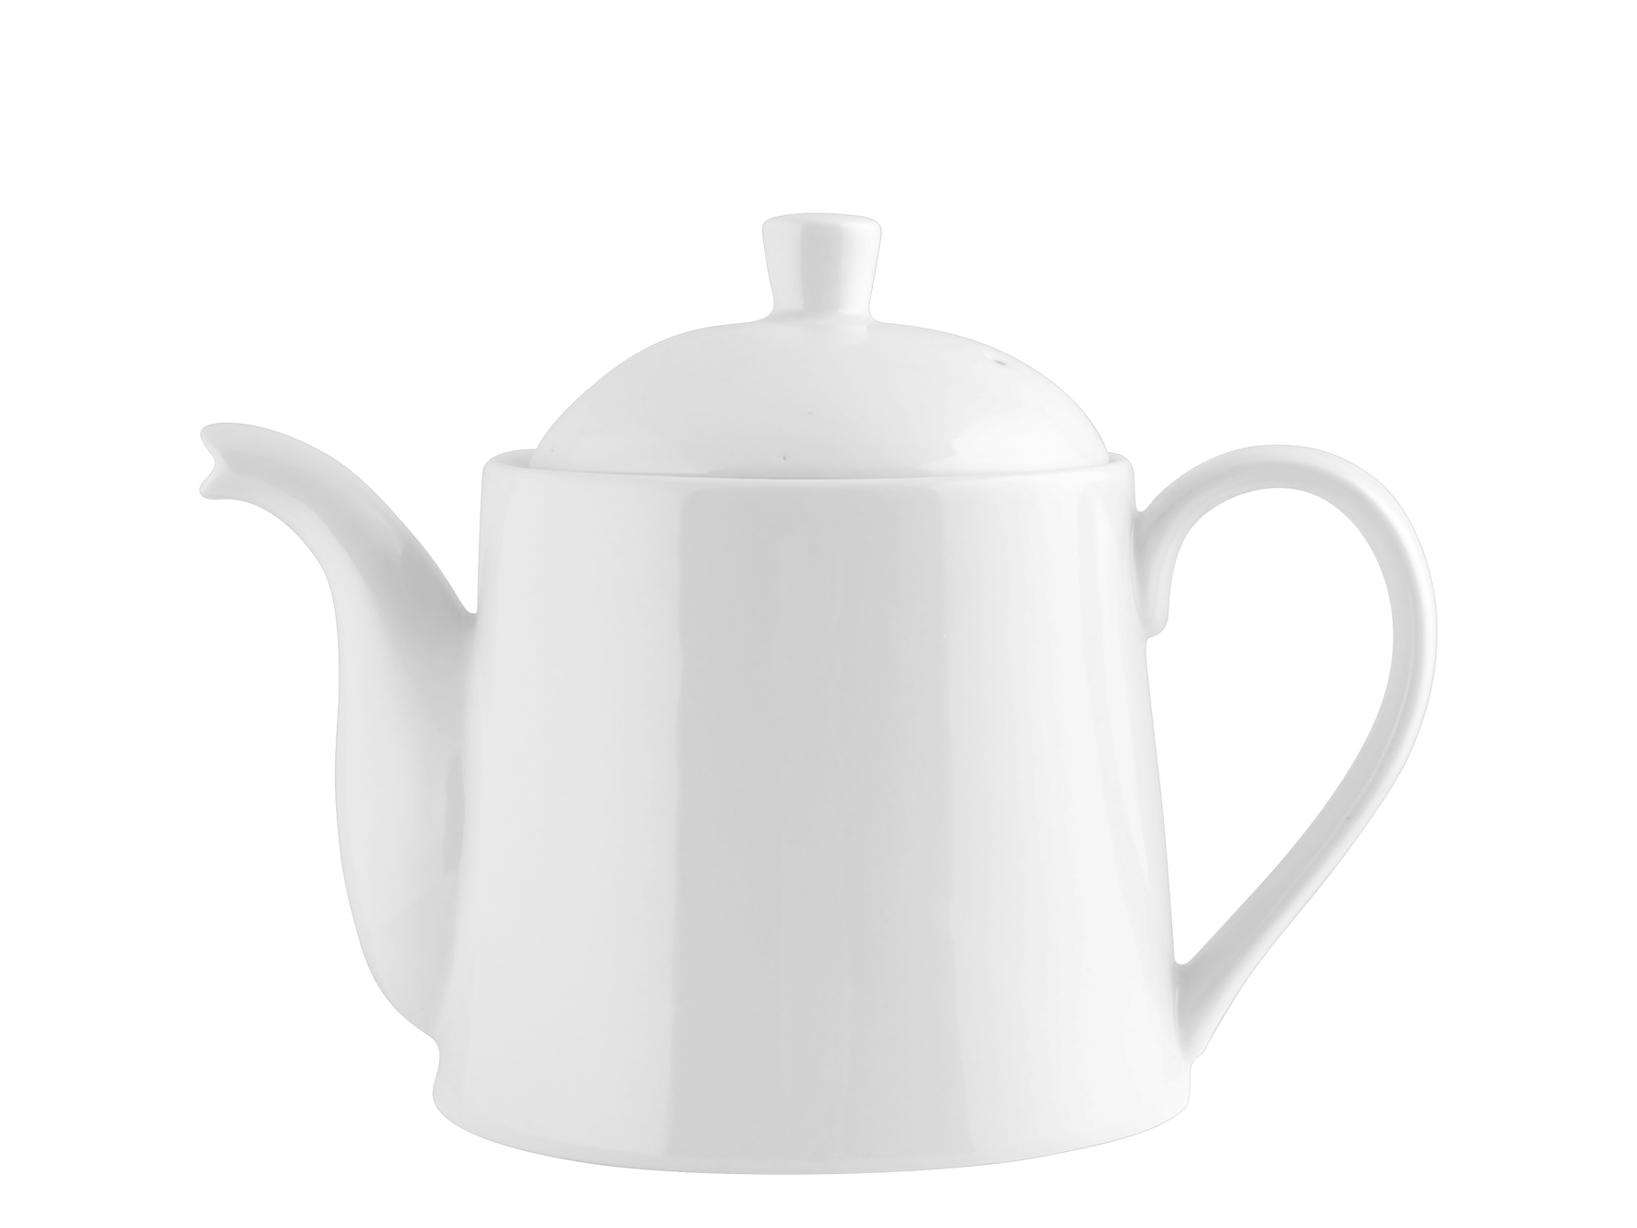 Teiera Porcellana Bianco Cc1250           6346